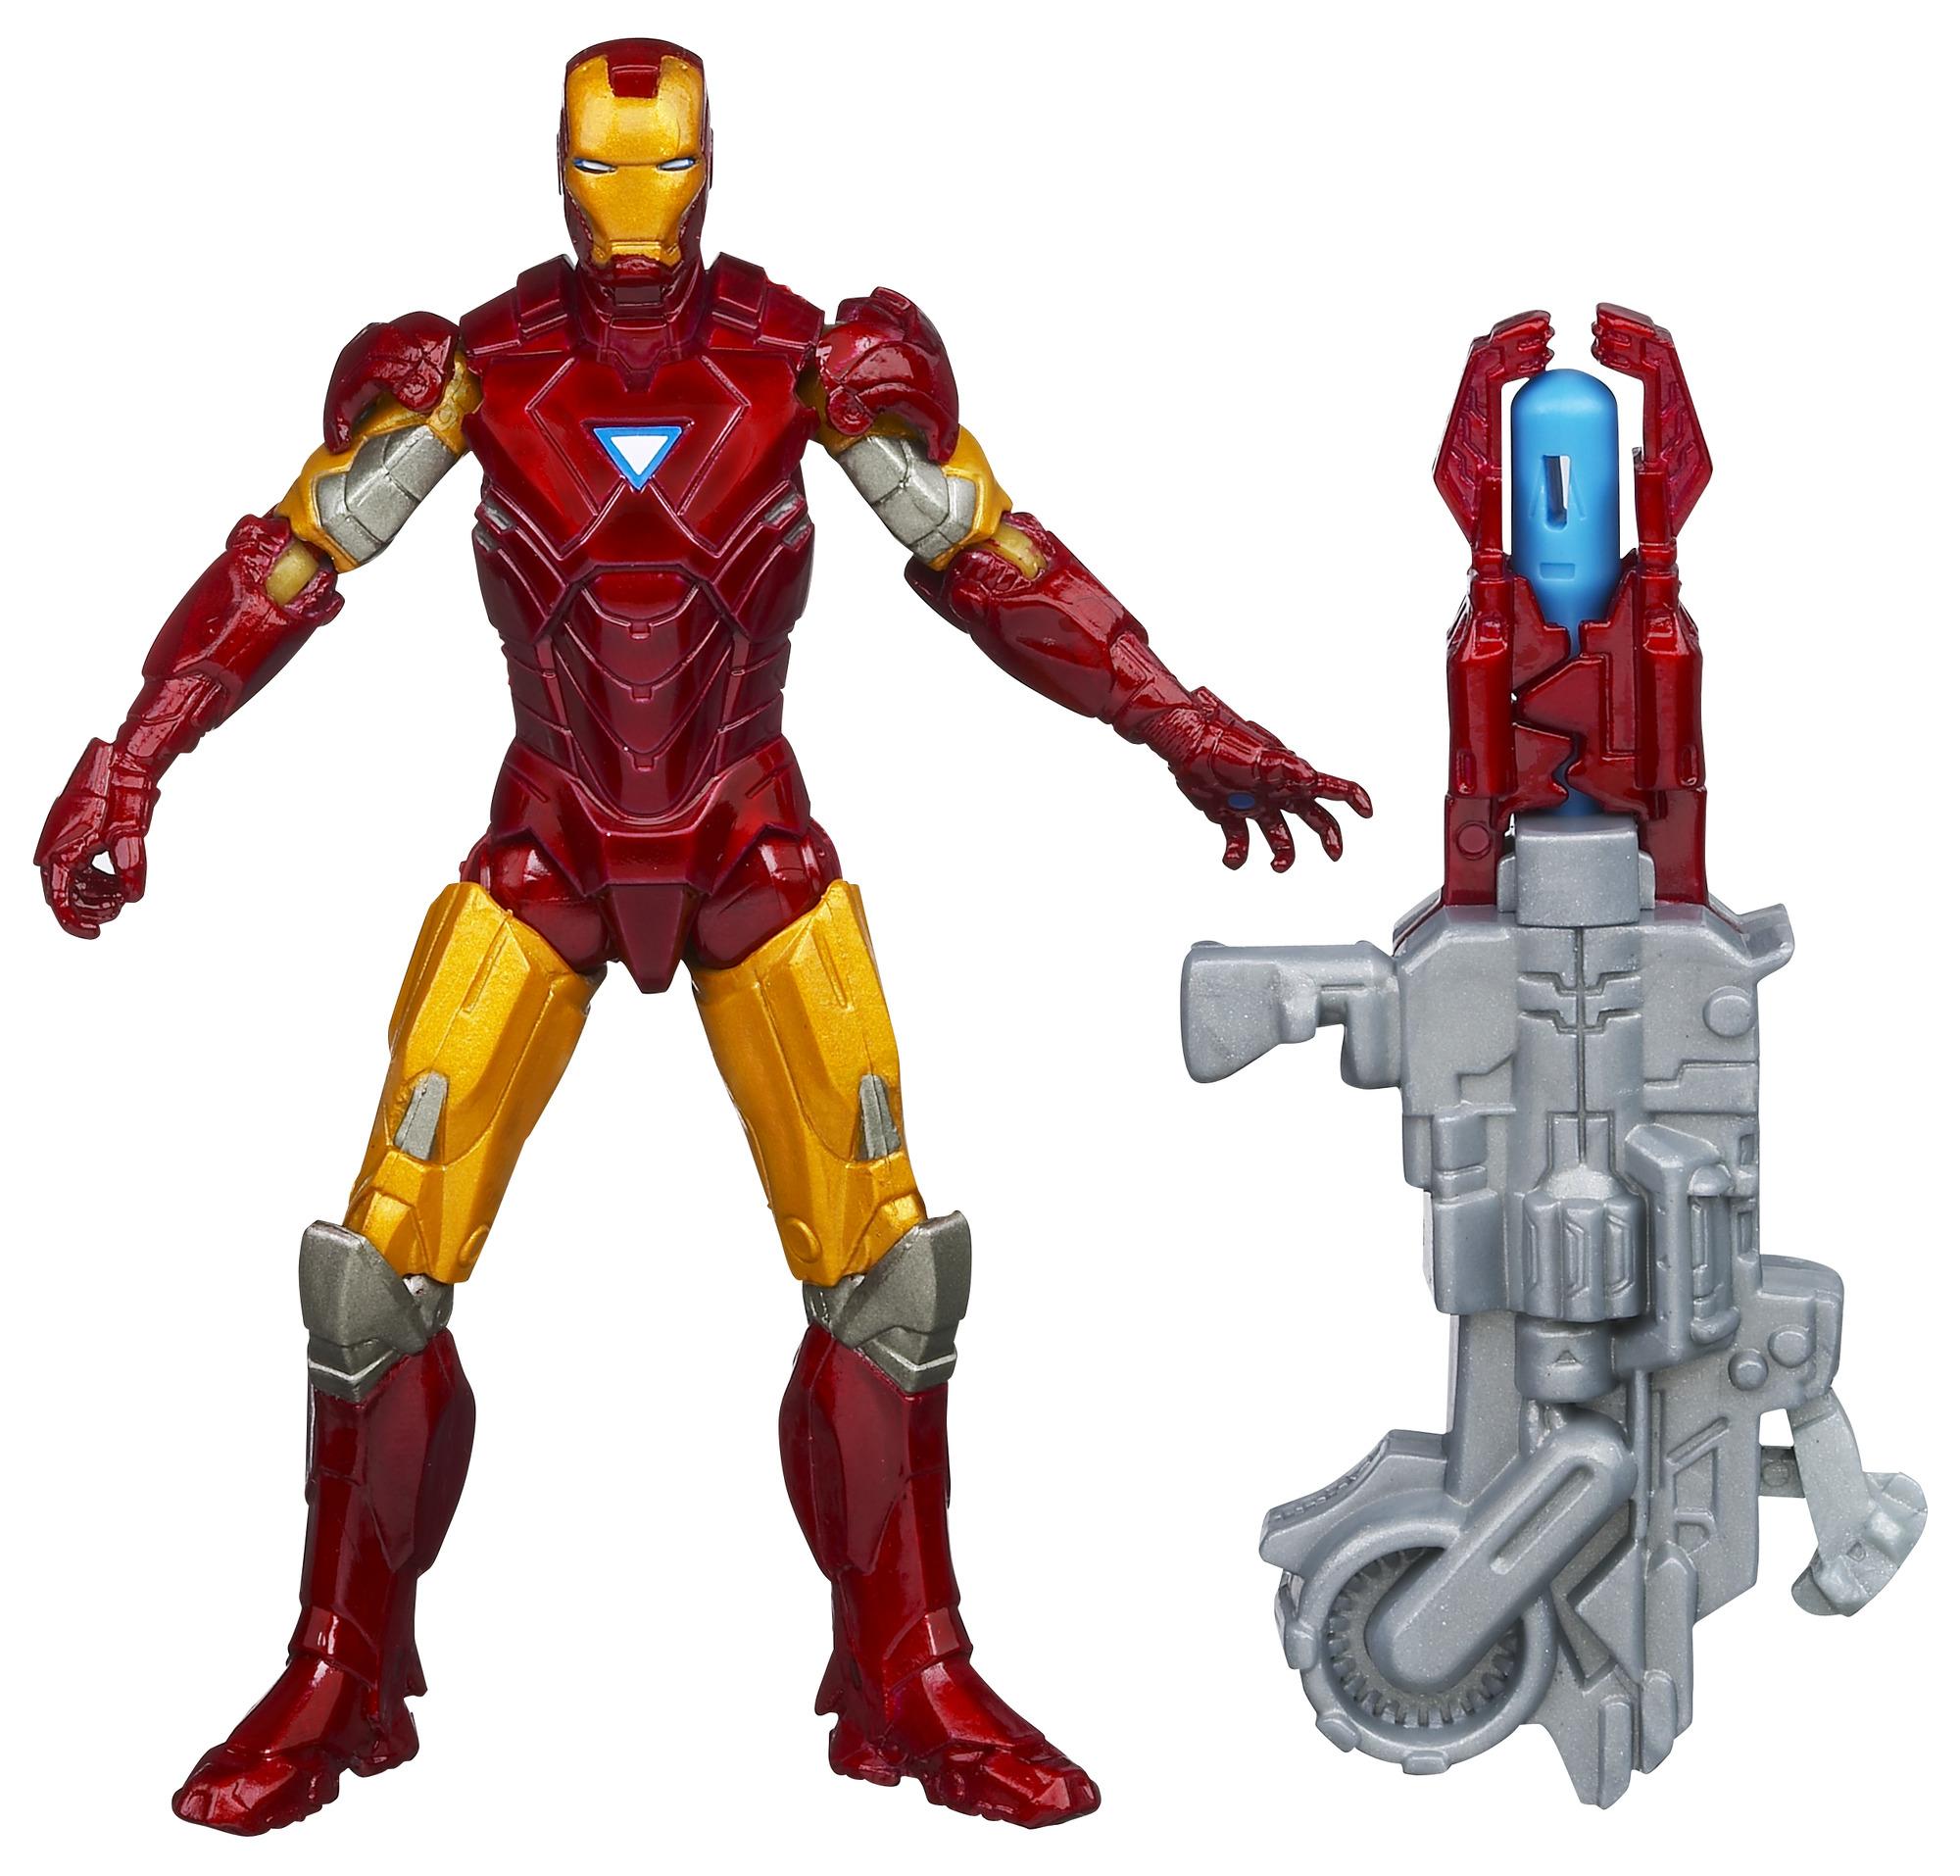 "Marvel Avengers Concept Series Heavy Artillery Iron Man 4"" Action Figure"